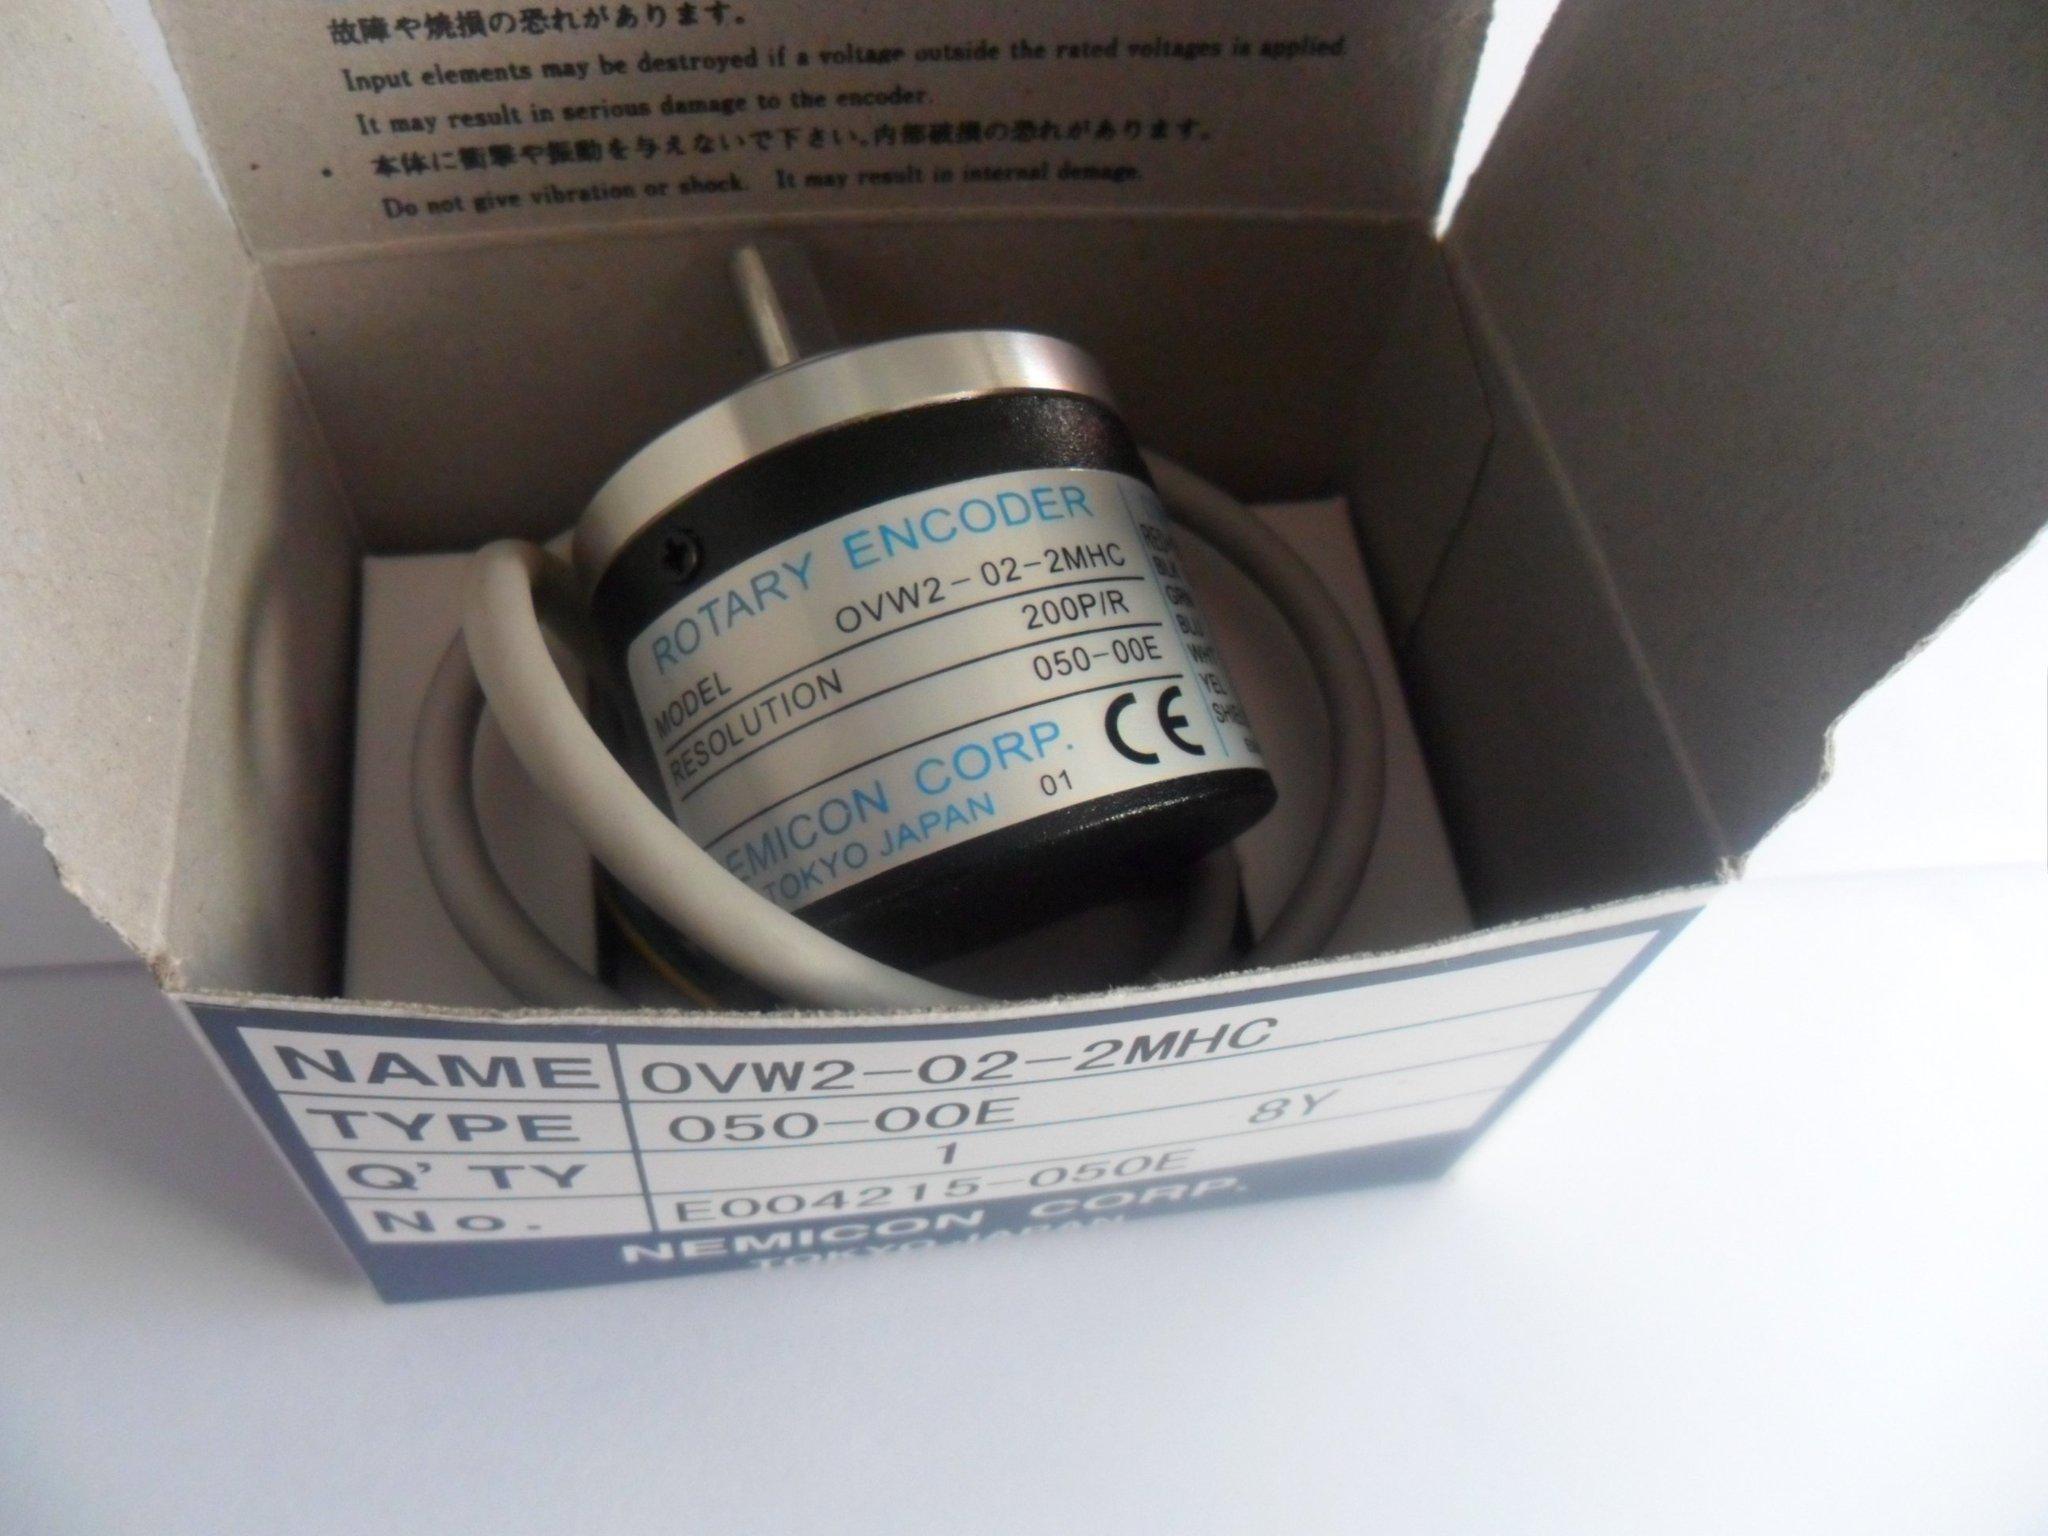 FREE SHIPPING Ovw2-06-2mht 38mm Encoder 600 Line Pulse Encoder Optical